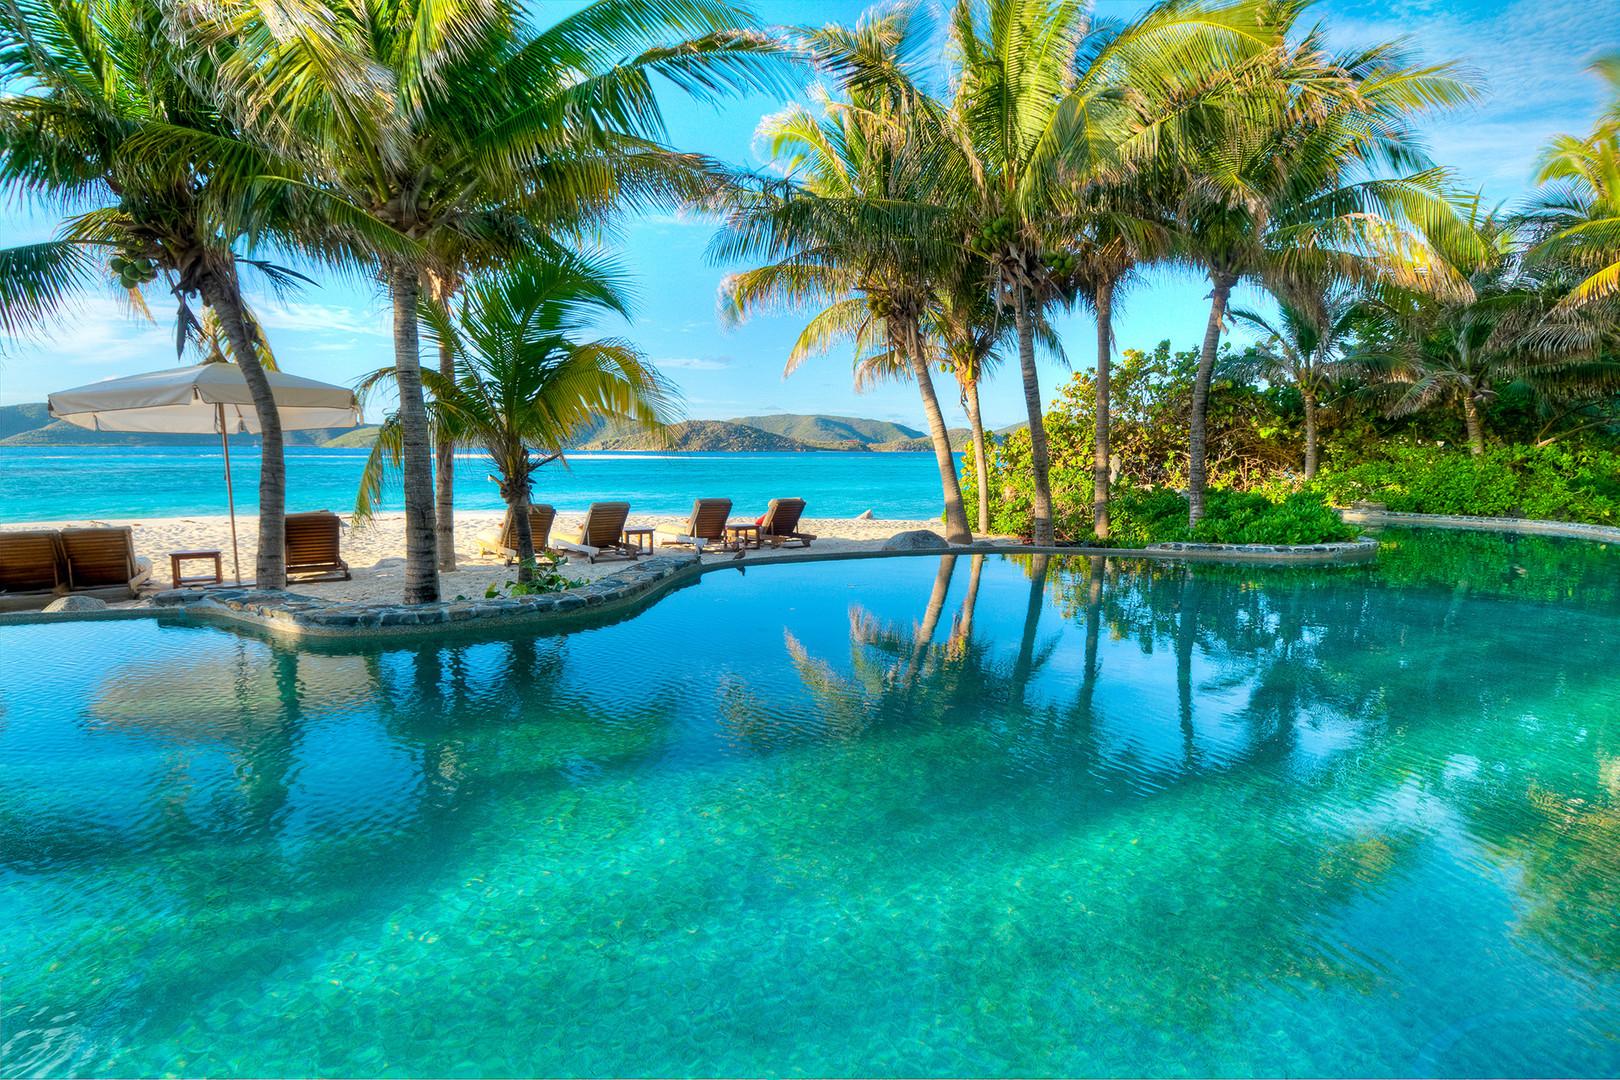 necker-island-beach-pool-infinity.jp